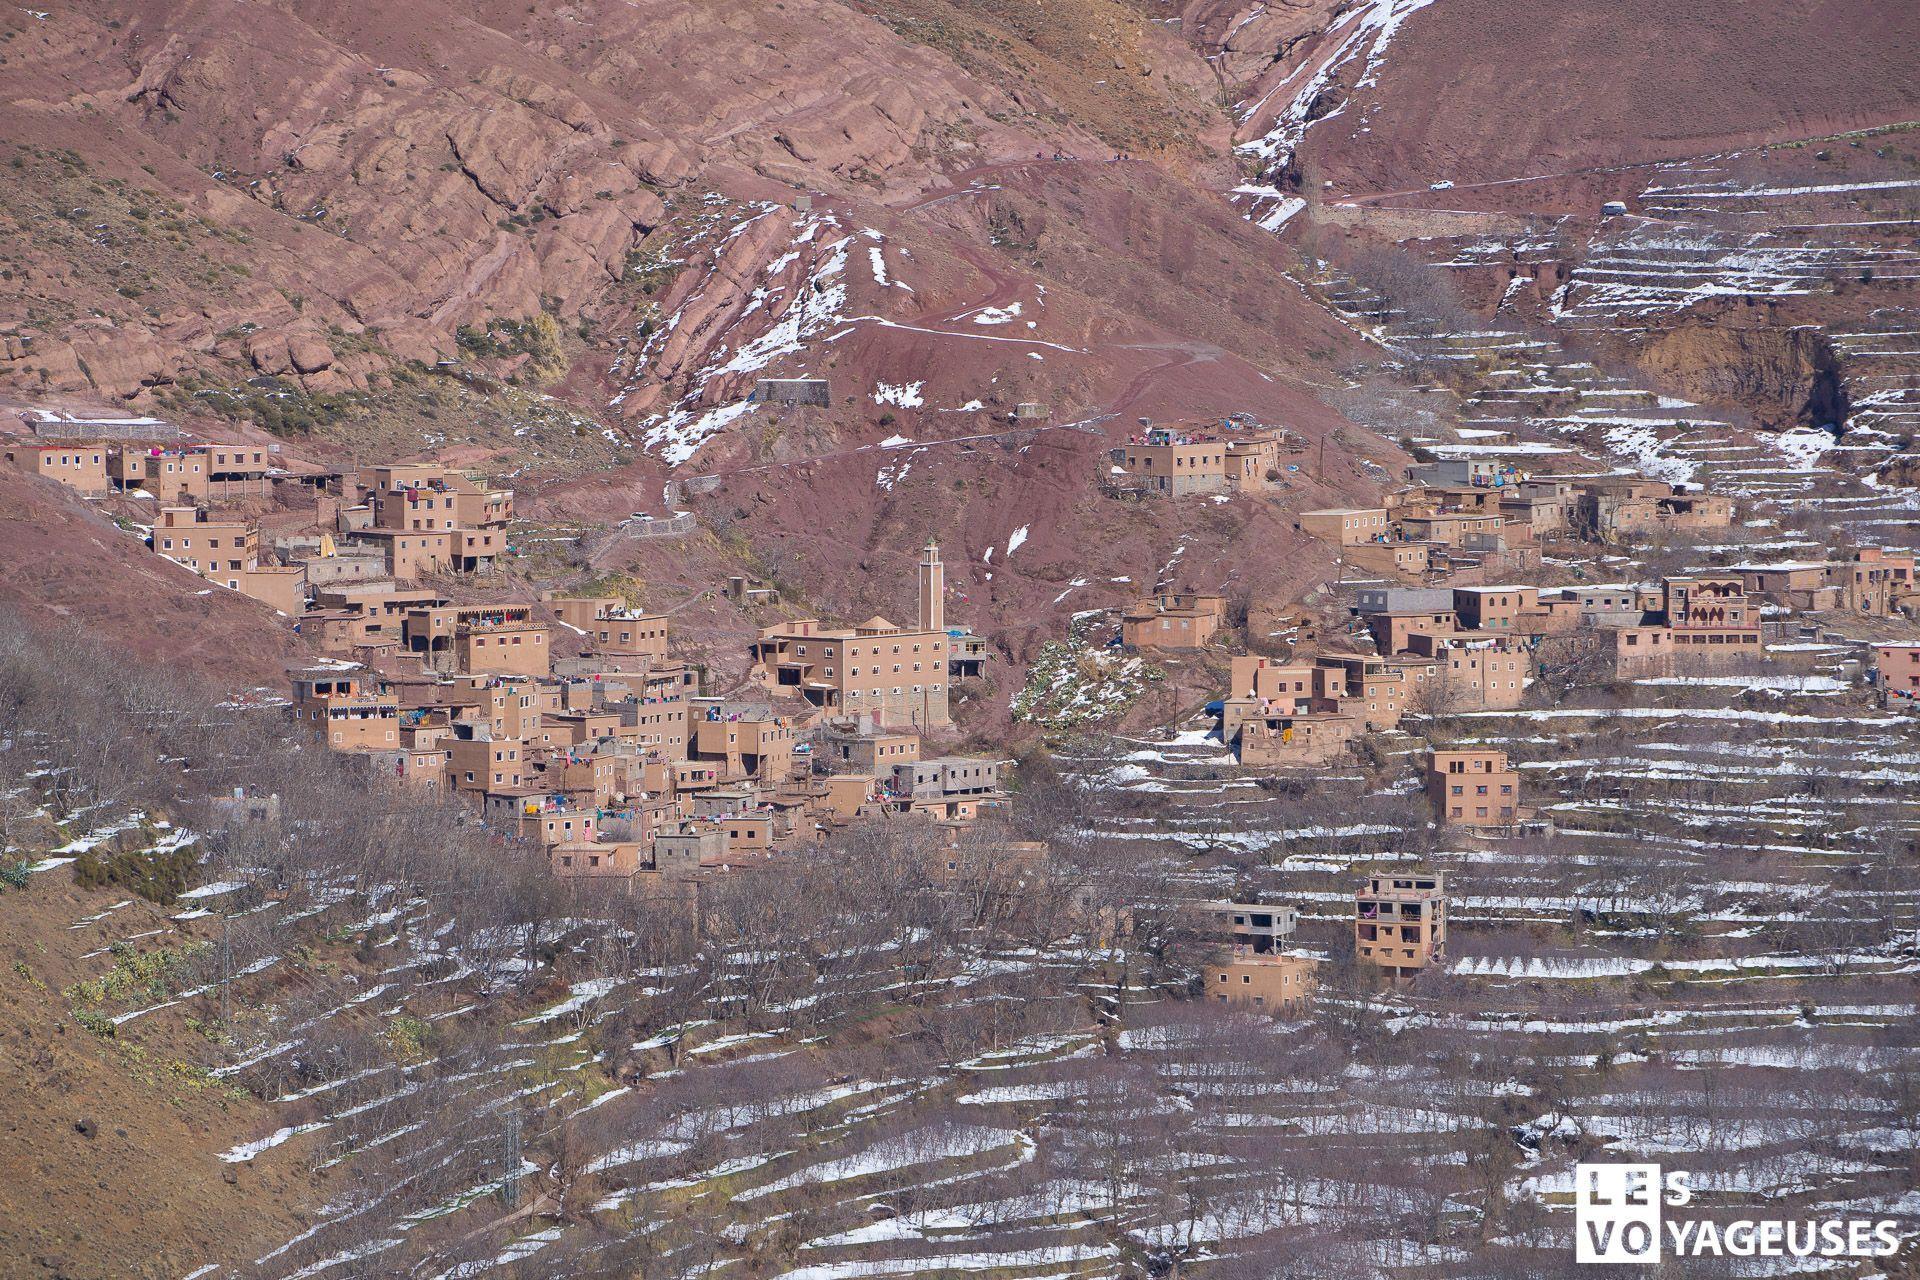 Les-voyageuses-maroc-imlil-hiver-00003